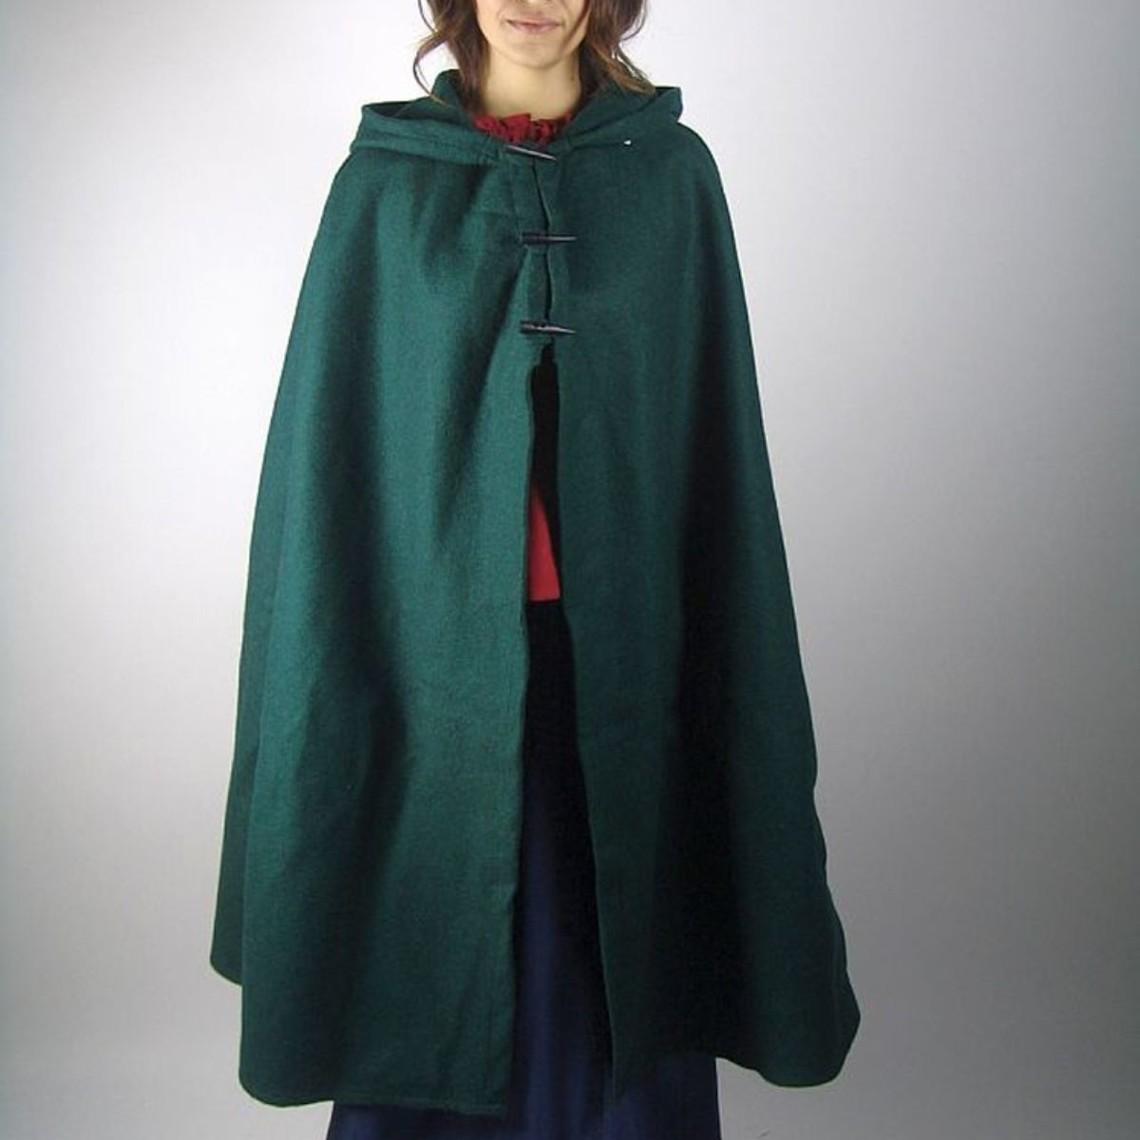 Leonardo Carbone Uld kappe Felis, grøn